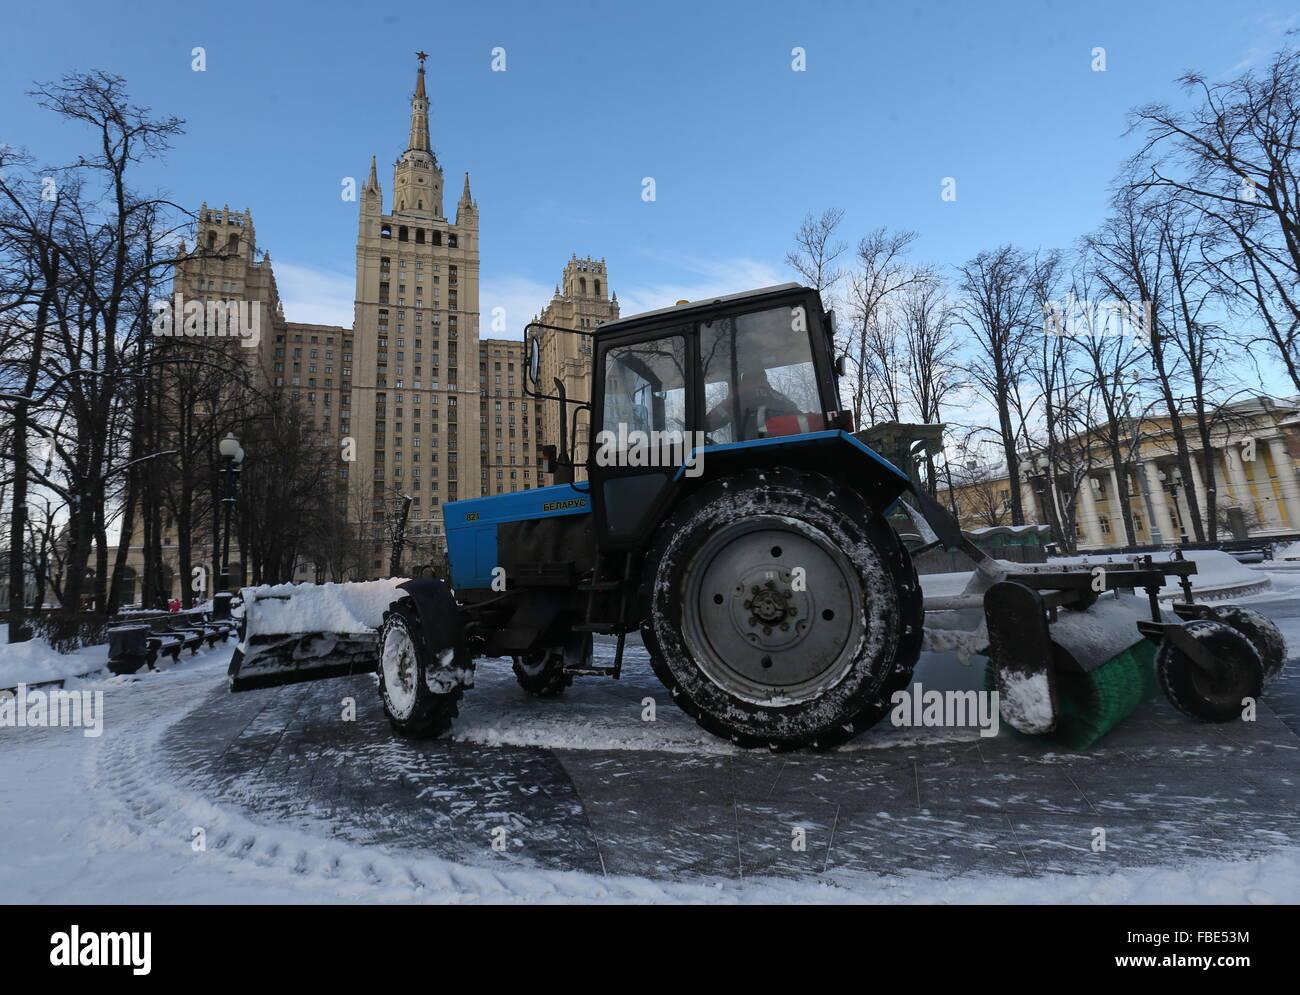 Moscow, Russia. 14th Jan, 2016. Snow clearing equipment in Kudrinskaya Square. © Vyacheslav Prokofyev/TASS/Alamy Stock Photo